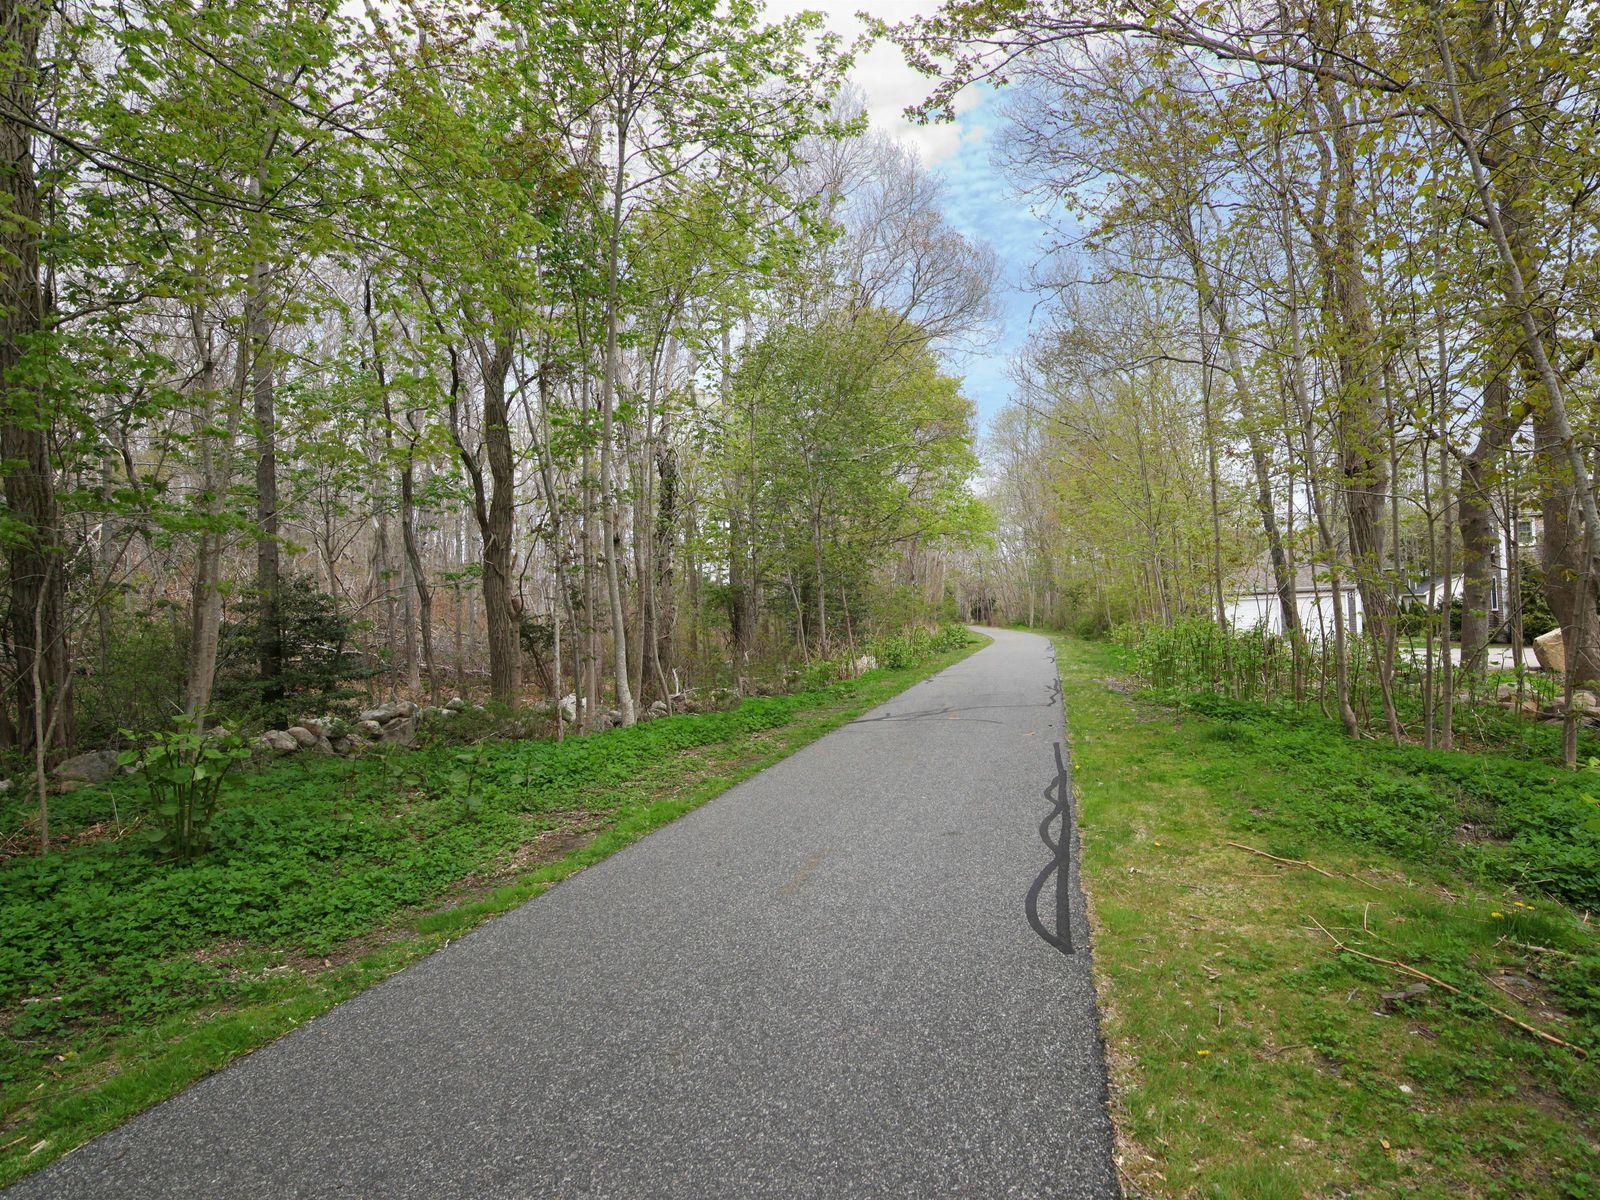 Village Darling Abutting Bike Path